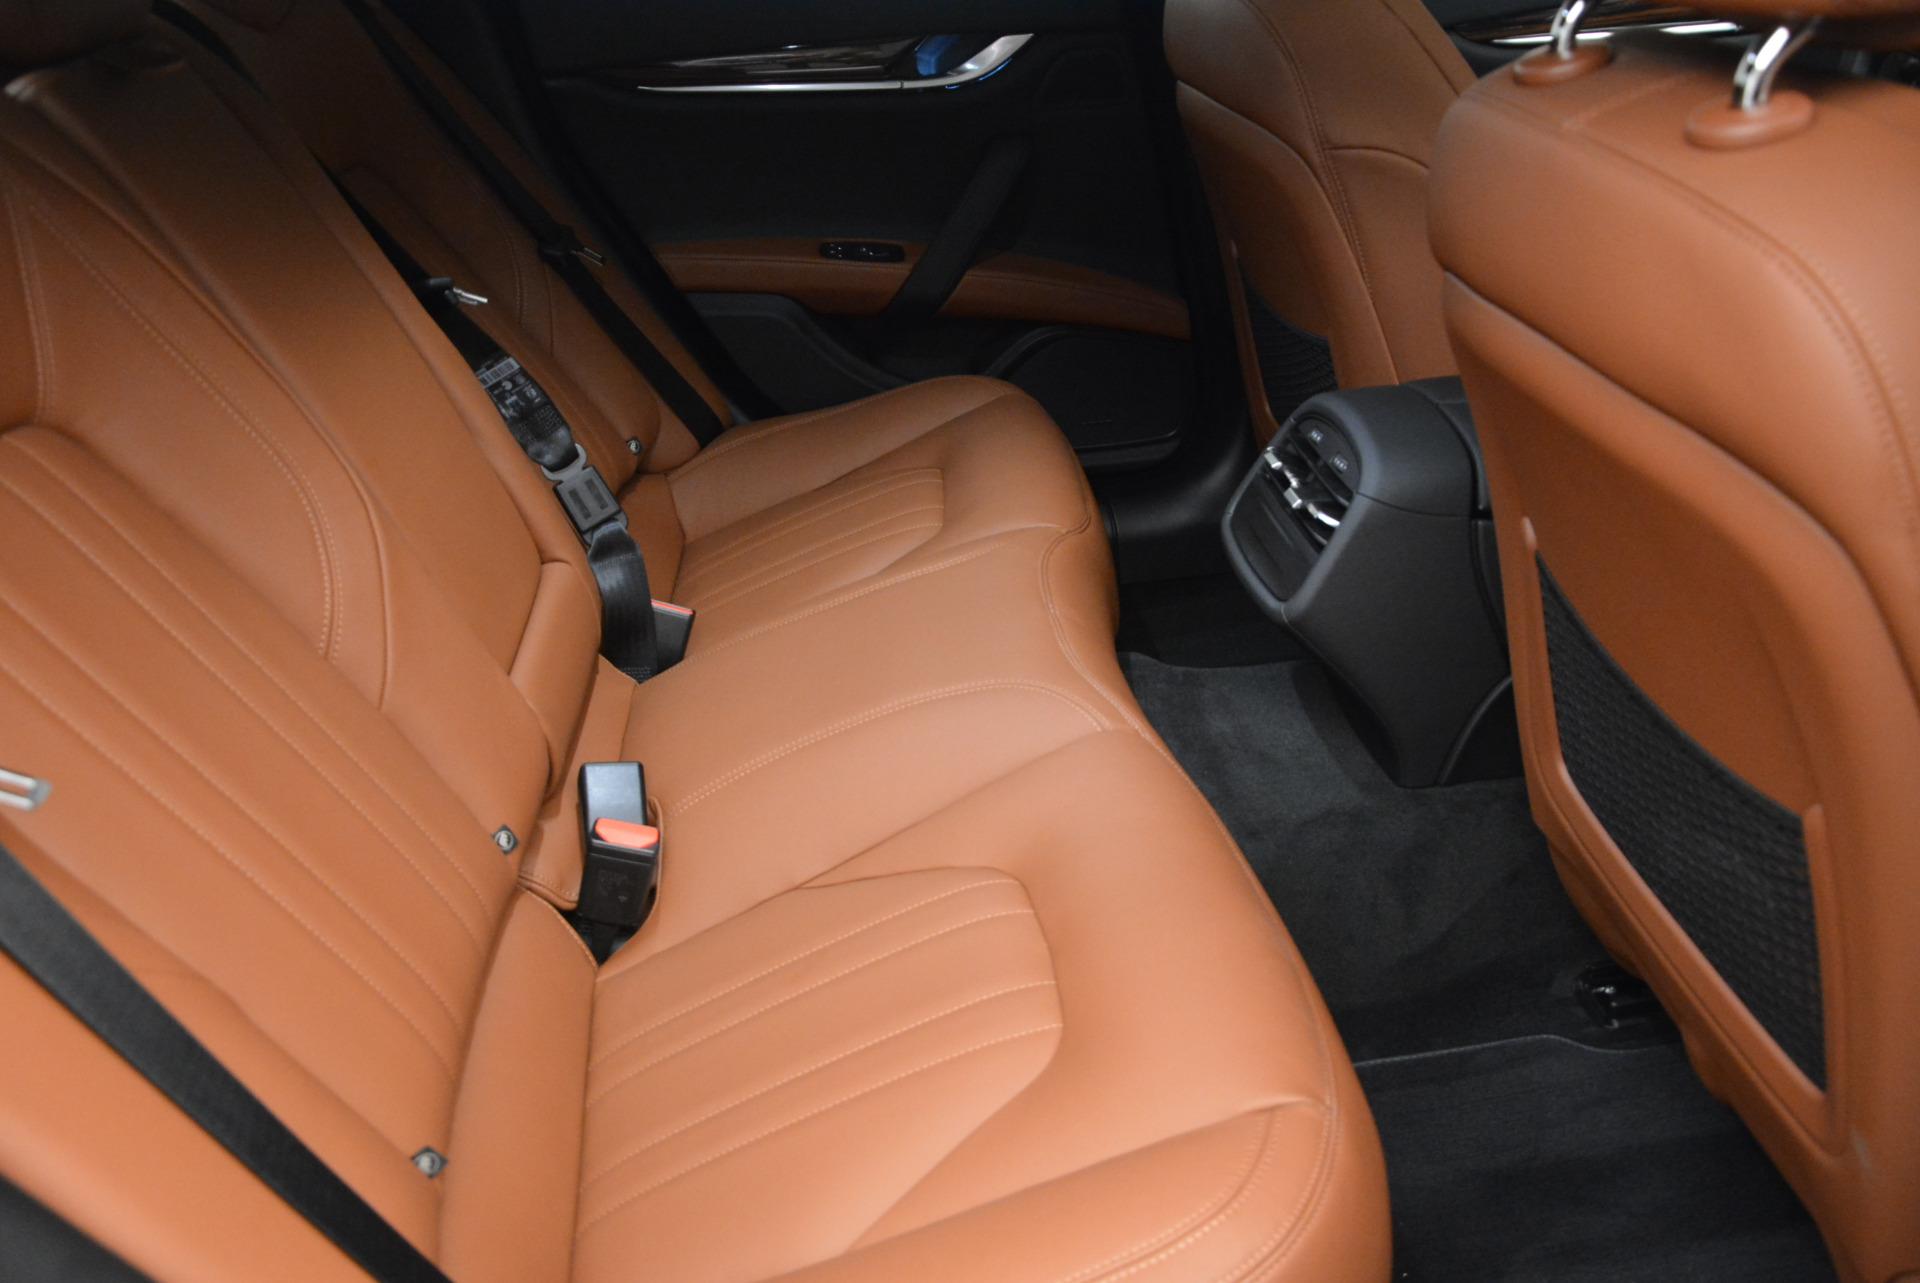 Used 2017 Maserati Ghibli S Q4 - EX Loaner For Sale In Greenwich, CT 567_p23